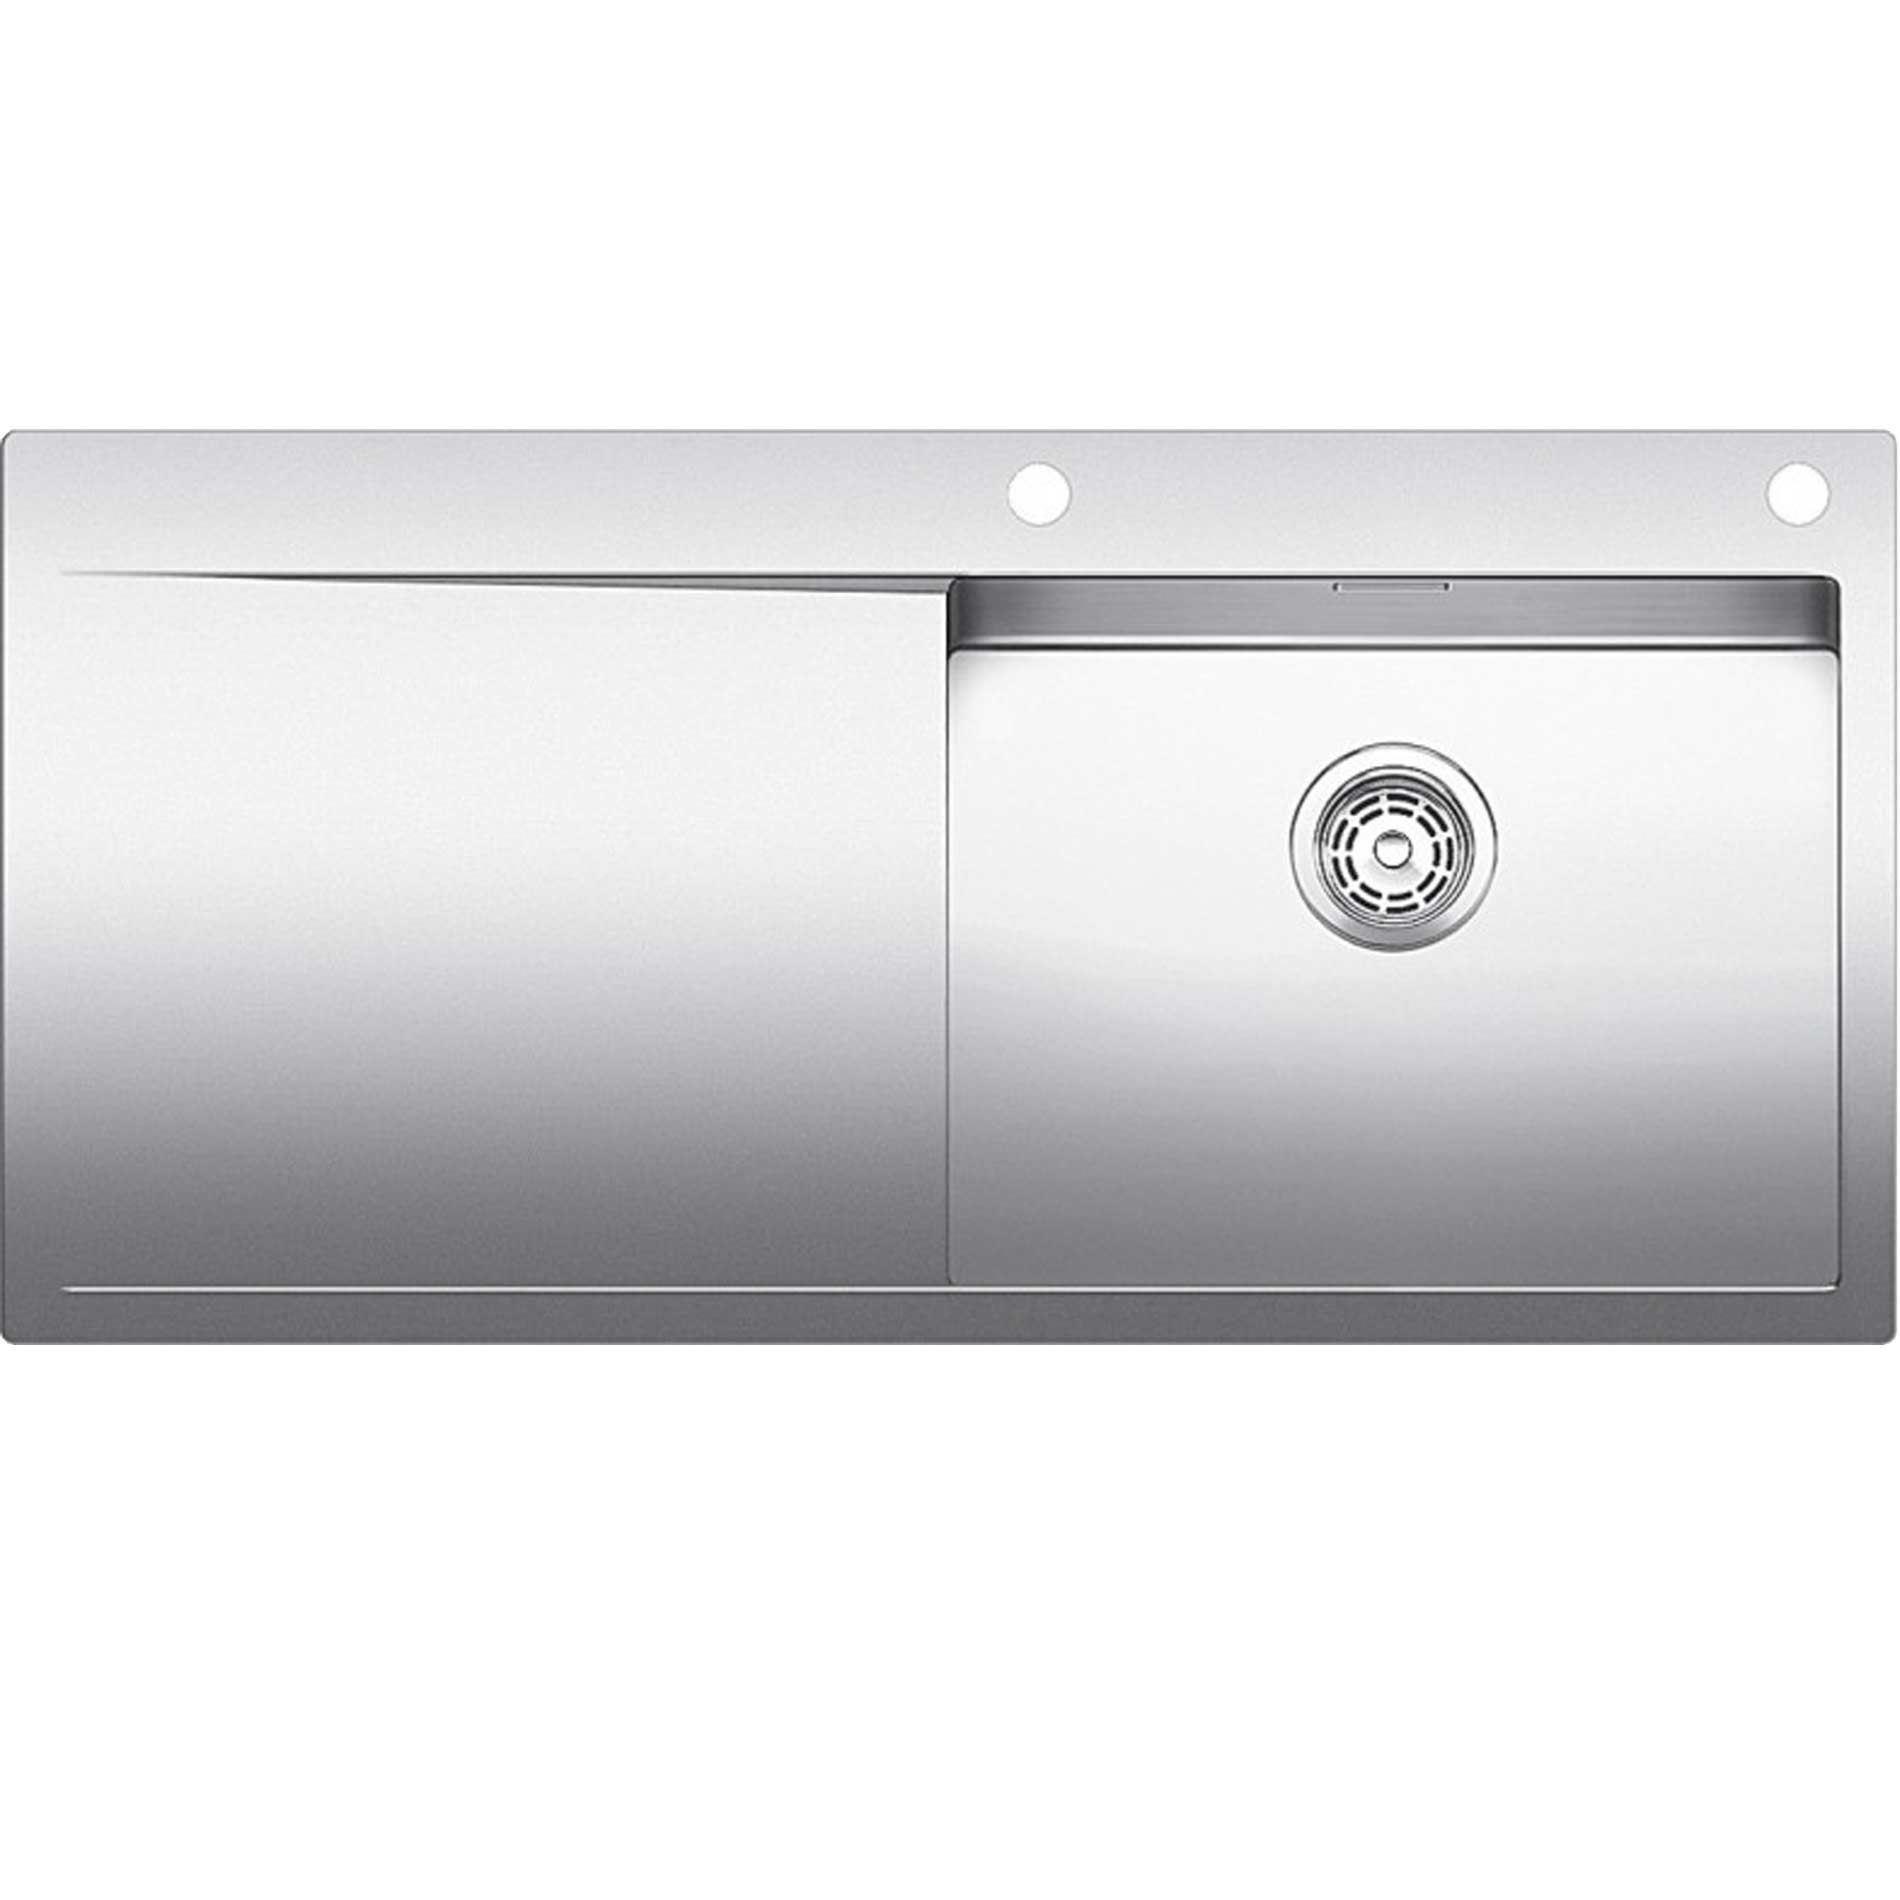 Blanco Flow Xl 6 S If Stainless Steel Sink Kitchen